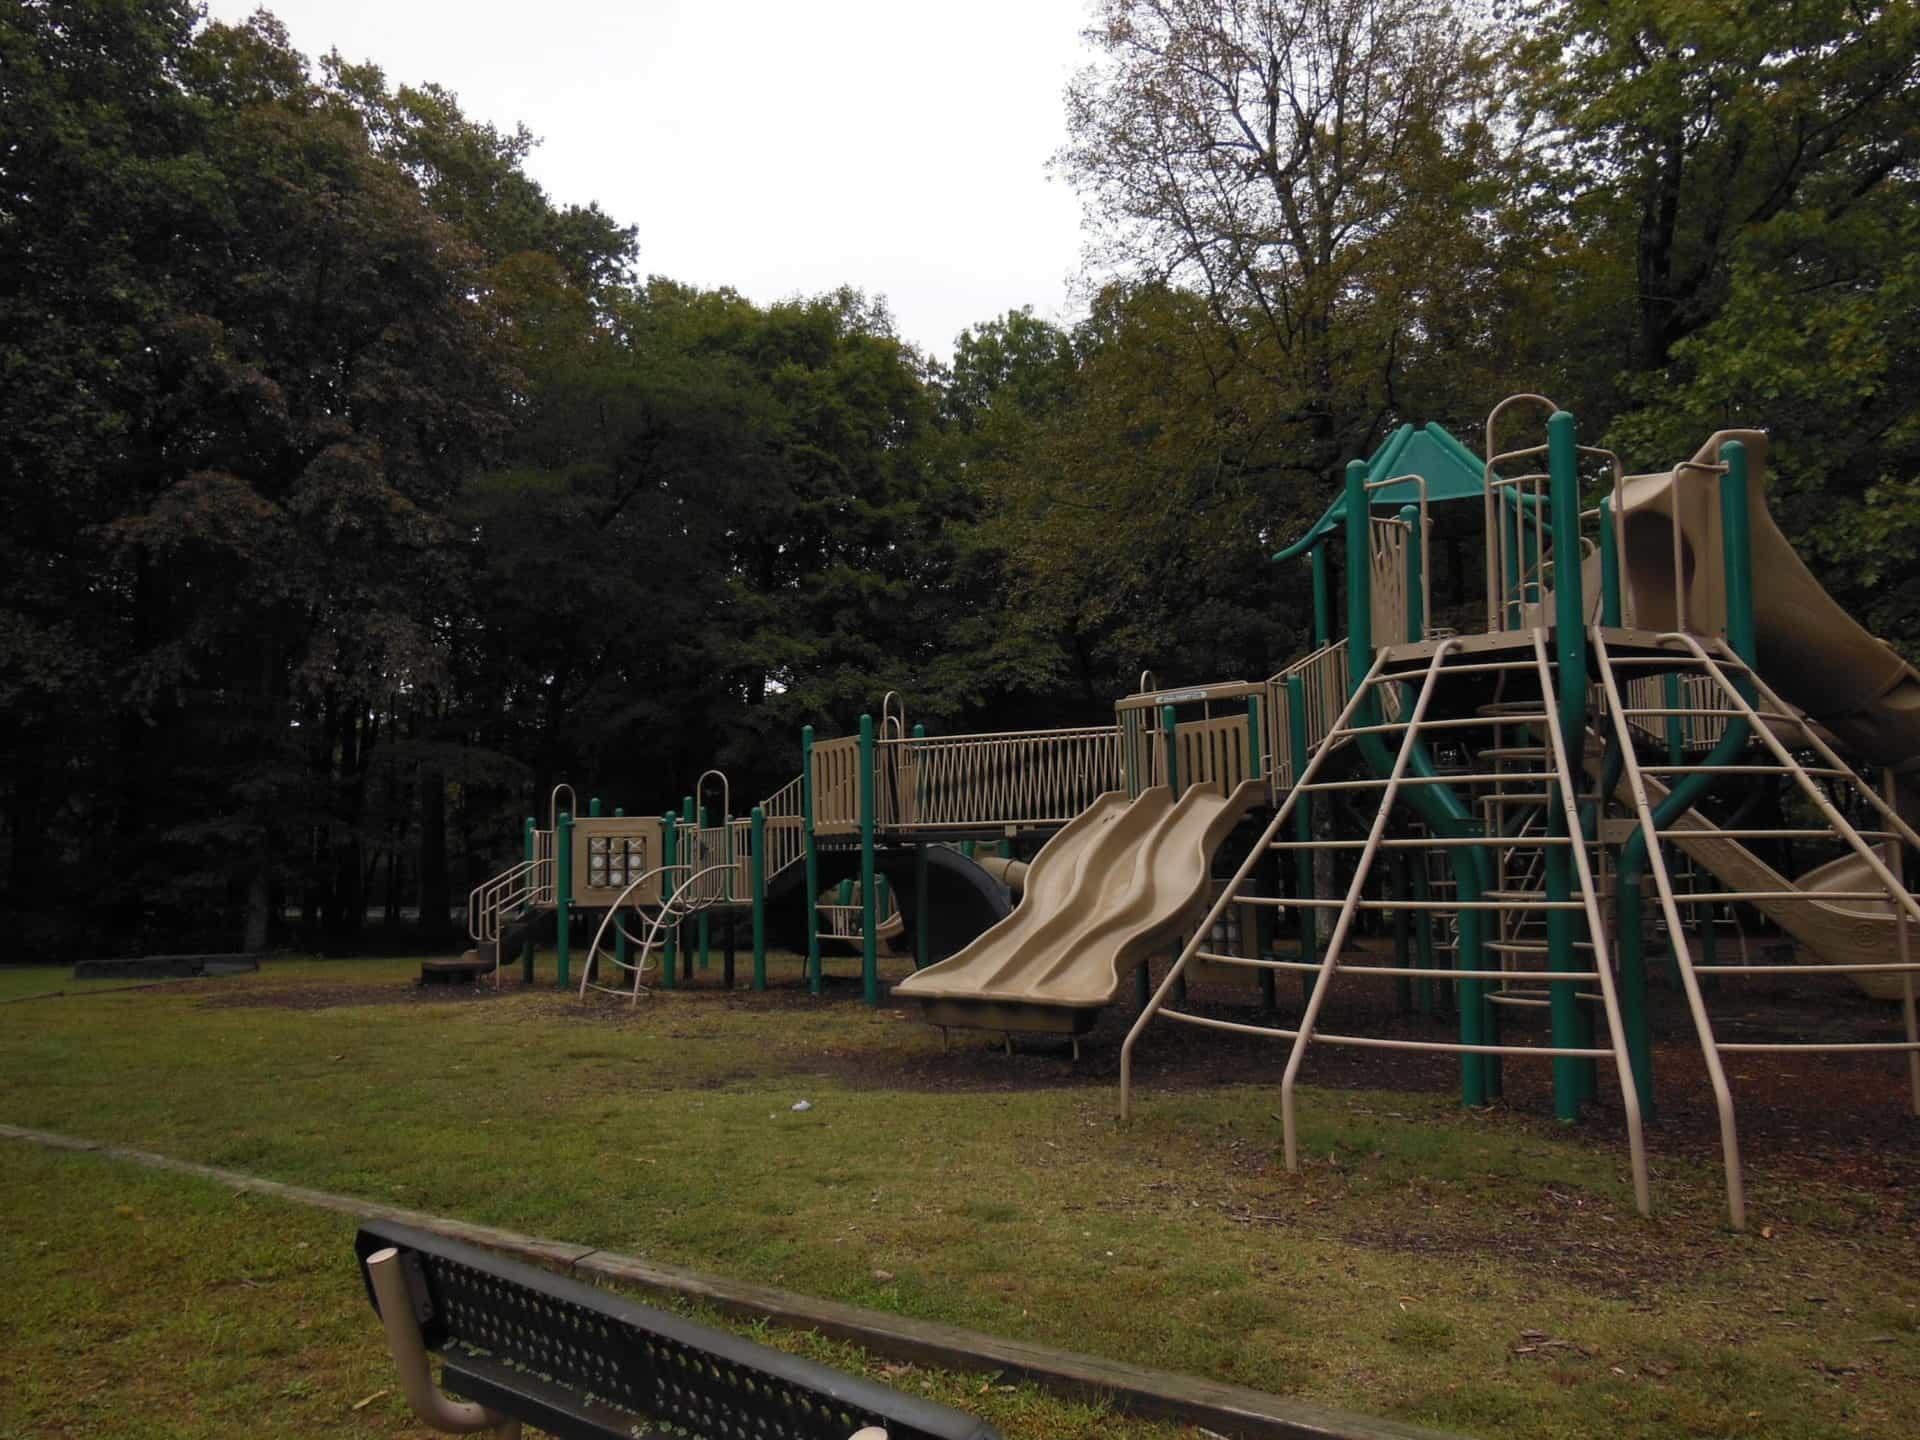 Monte Sano State Park - Playscape